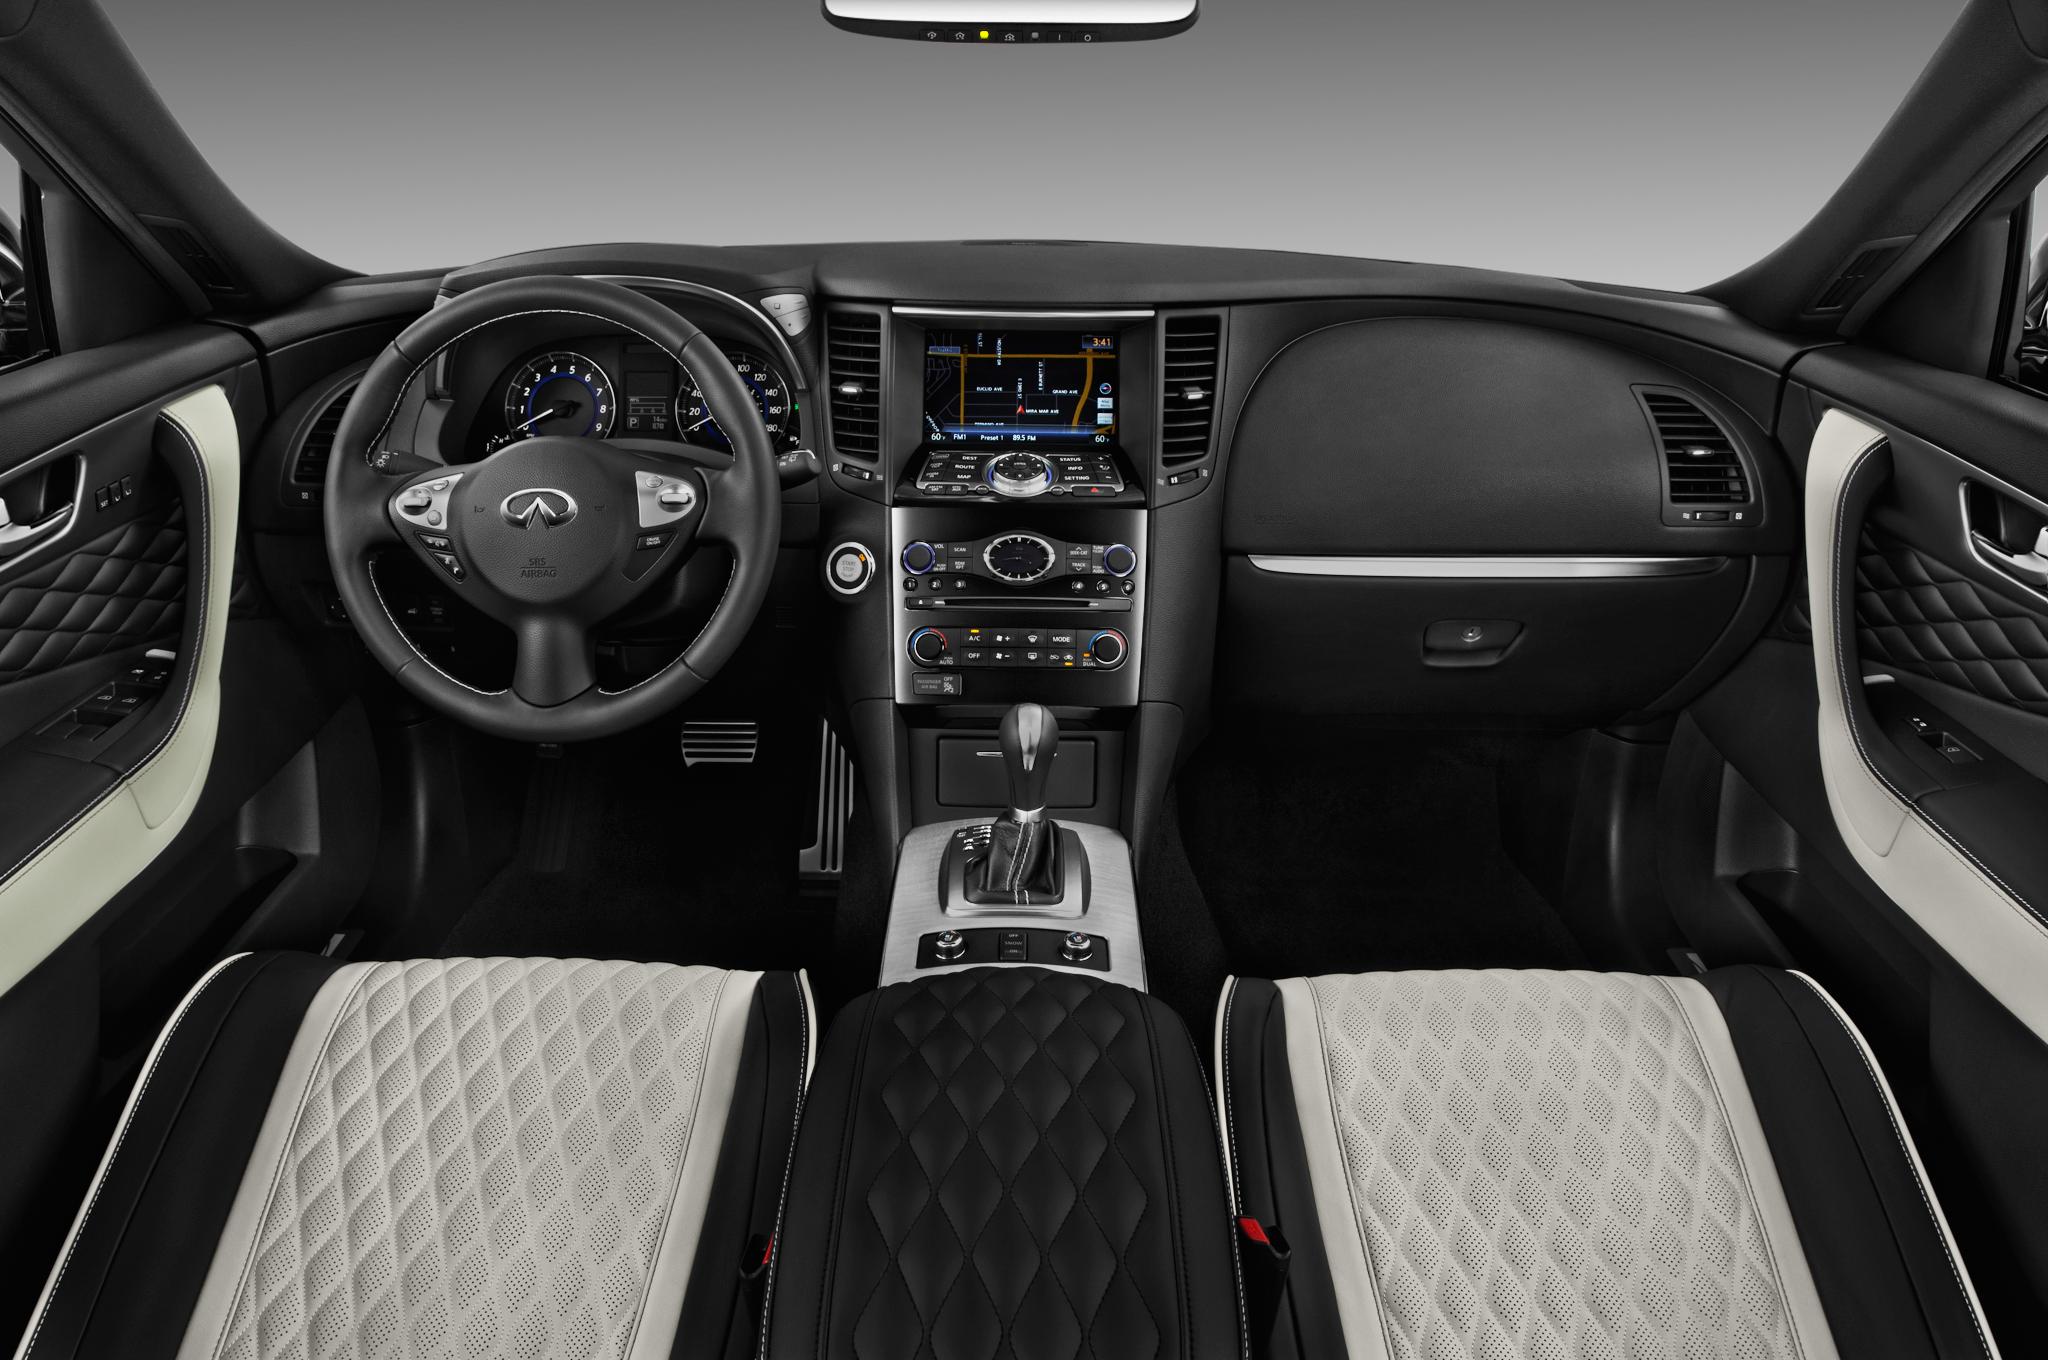 Santa Fe Suv >> 2017 Infiniti QX70 Limited Debuts at 2016 New York Auto Show